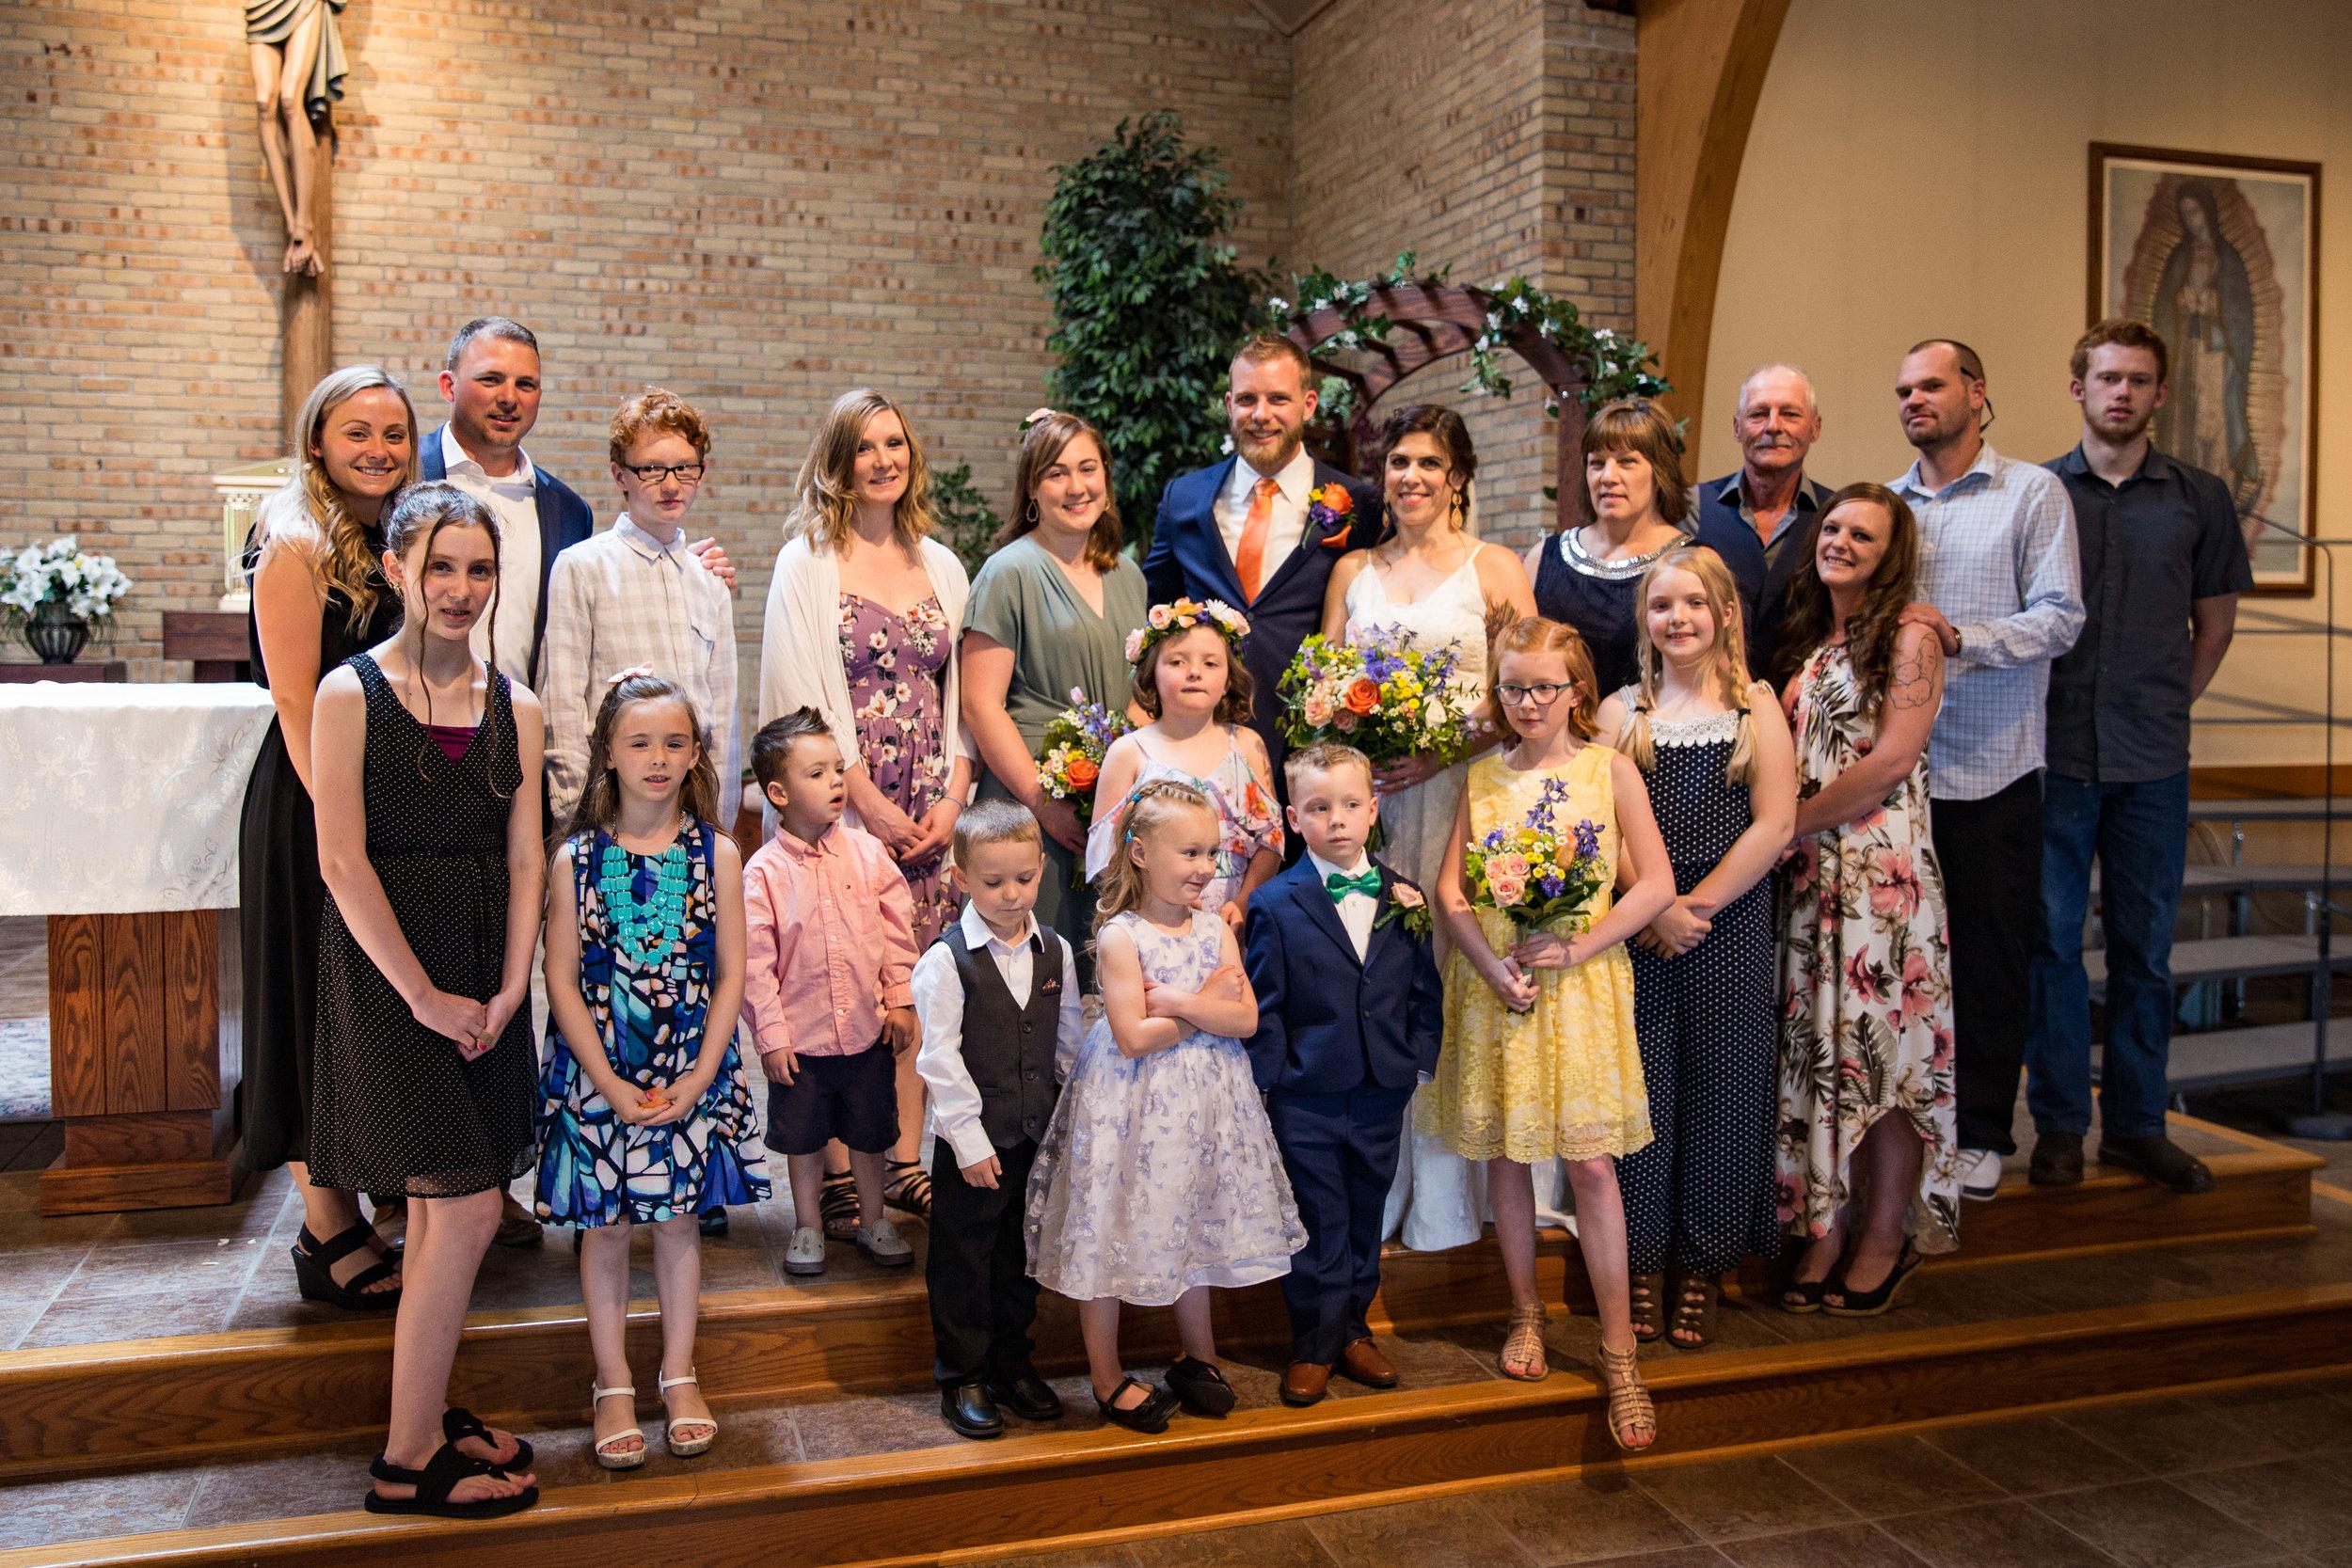 Natalie and Dallas Mooney Wedding 6-8-19_Tania Watt Photography-182.jpg